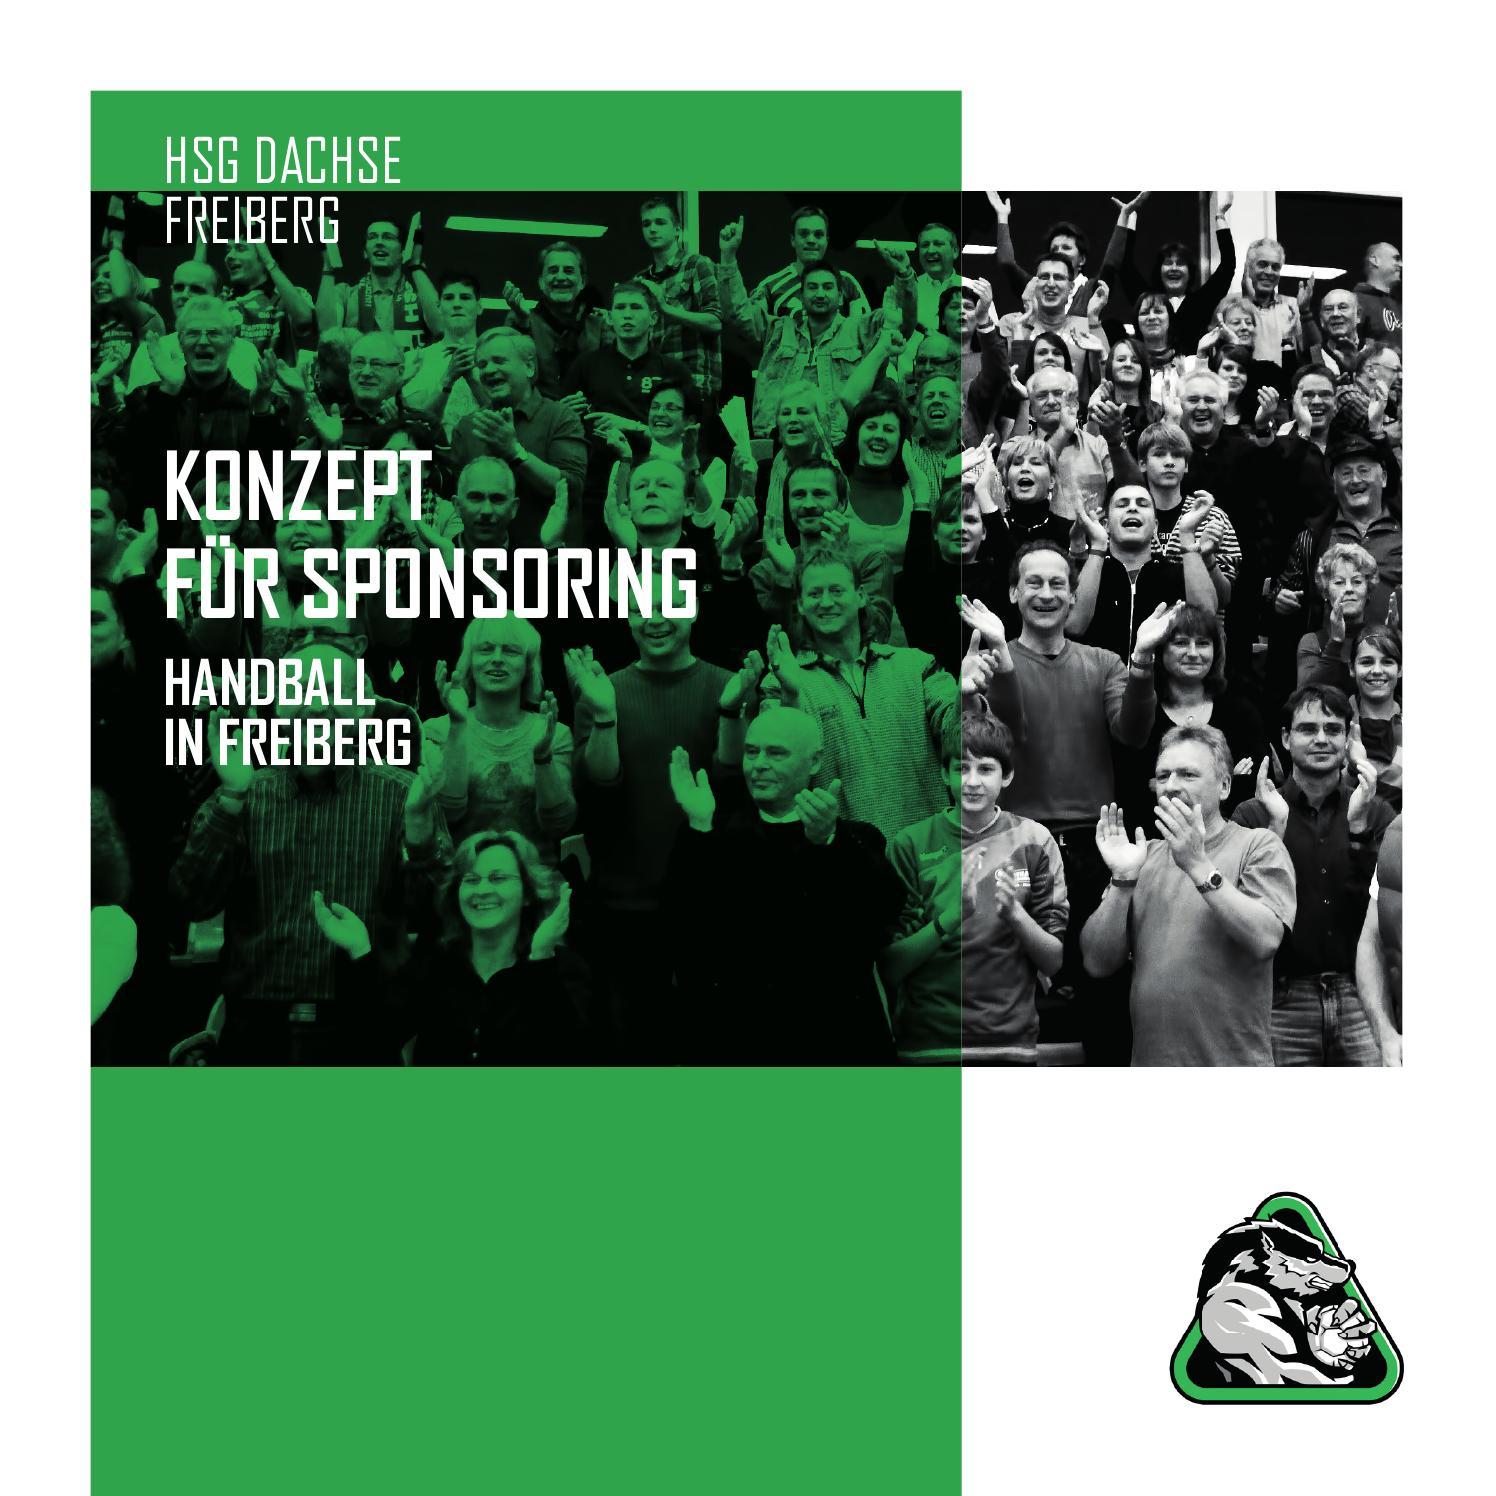 freiberg handball